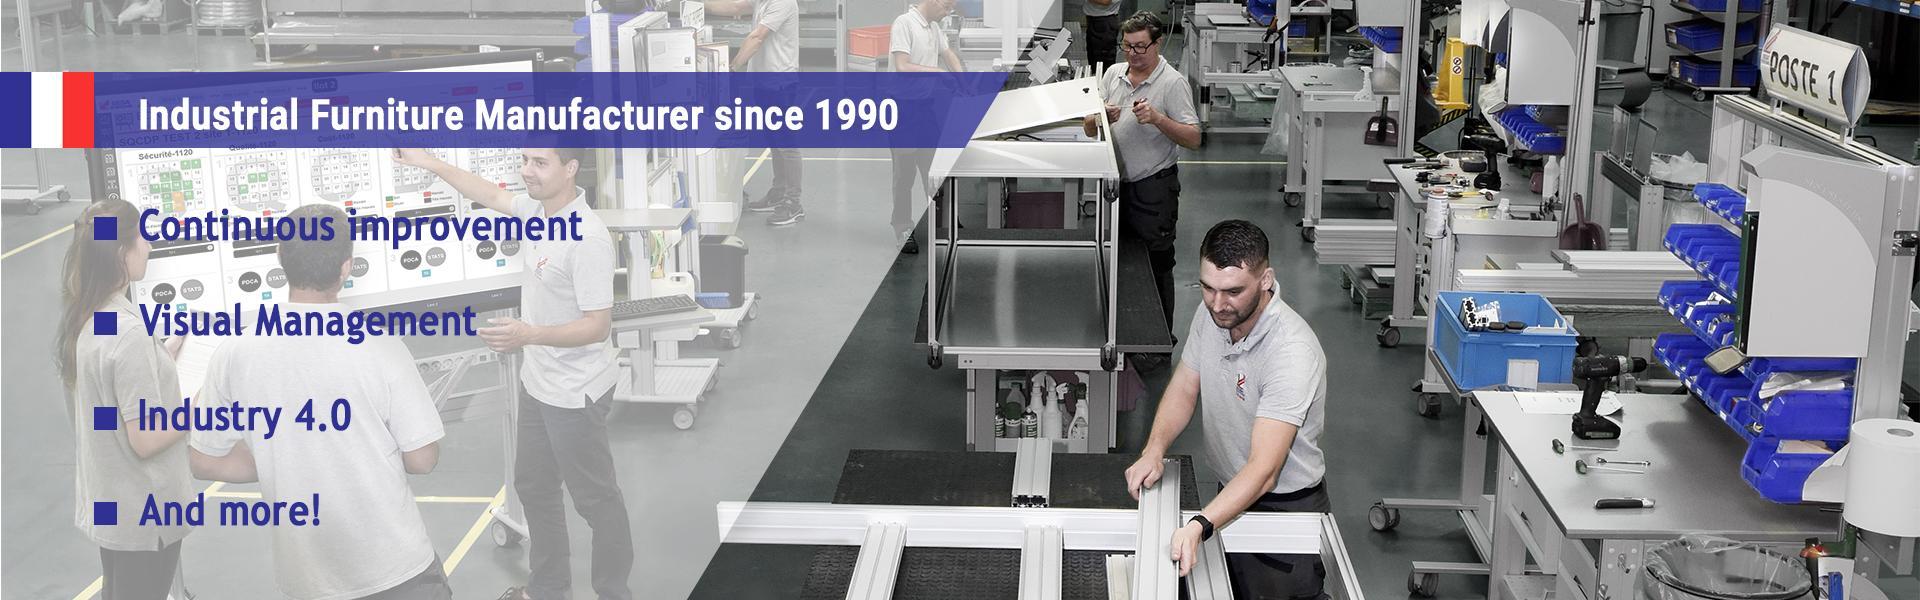 Industrial Furniture Manufacturer since 1990